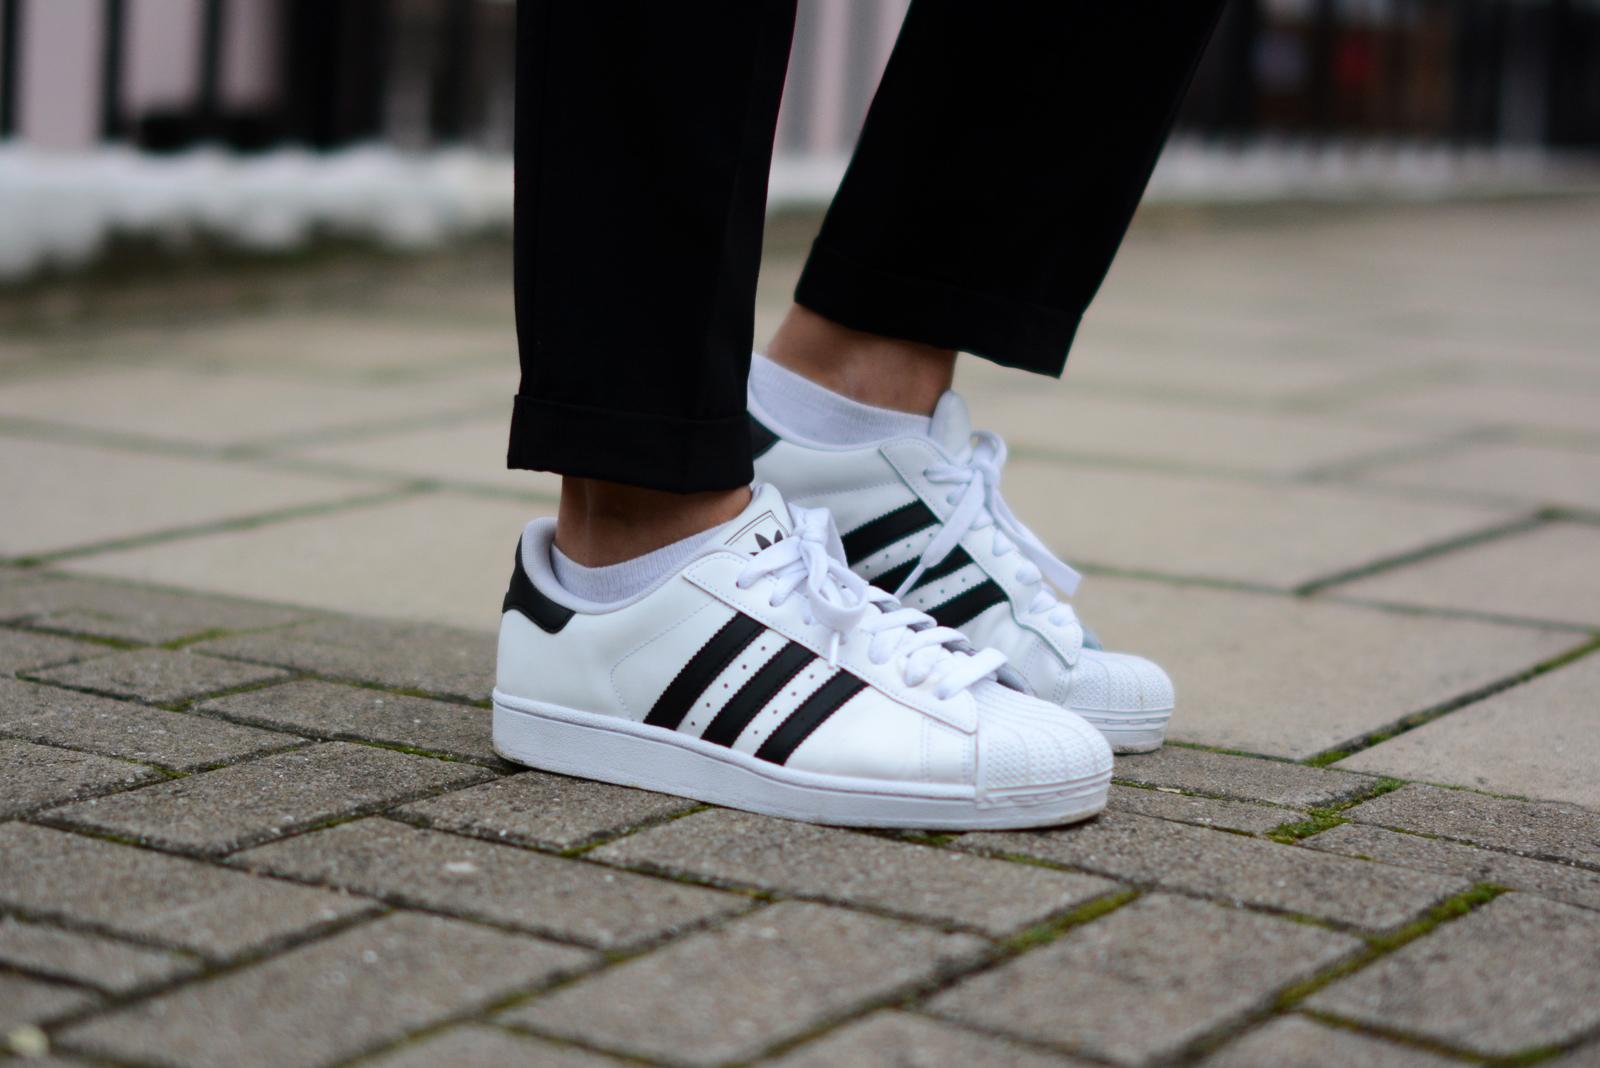 chaussure style adidas,chaussure femme adidas originale